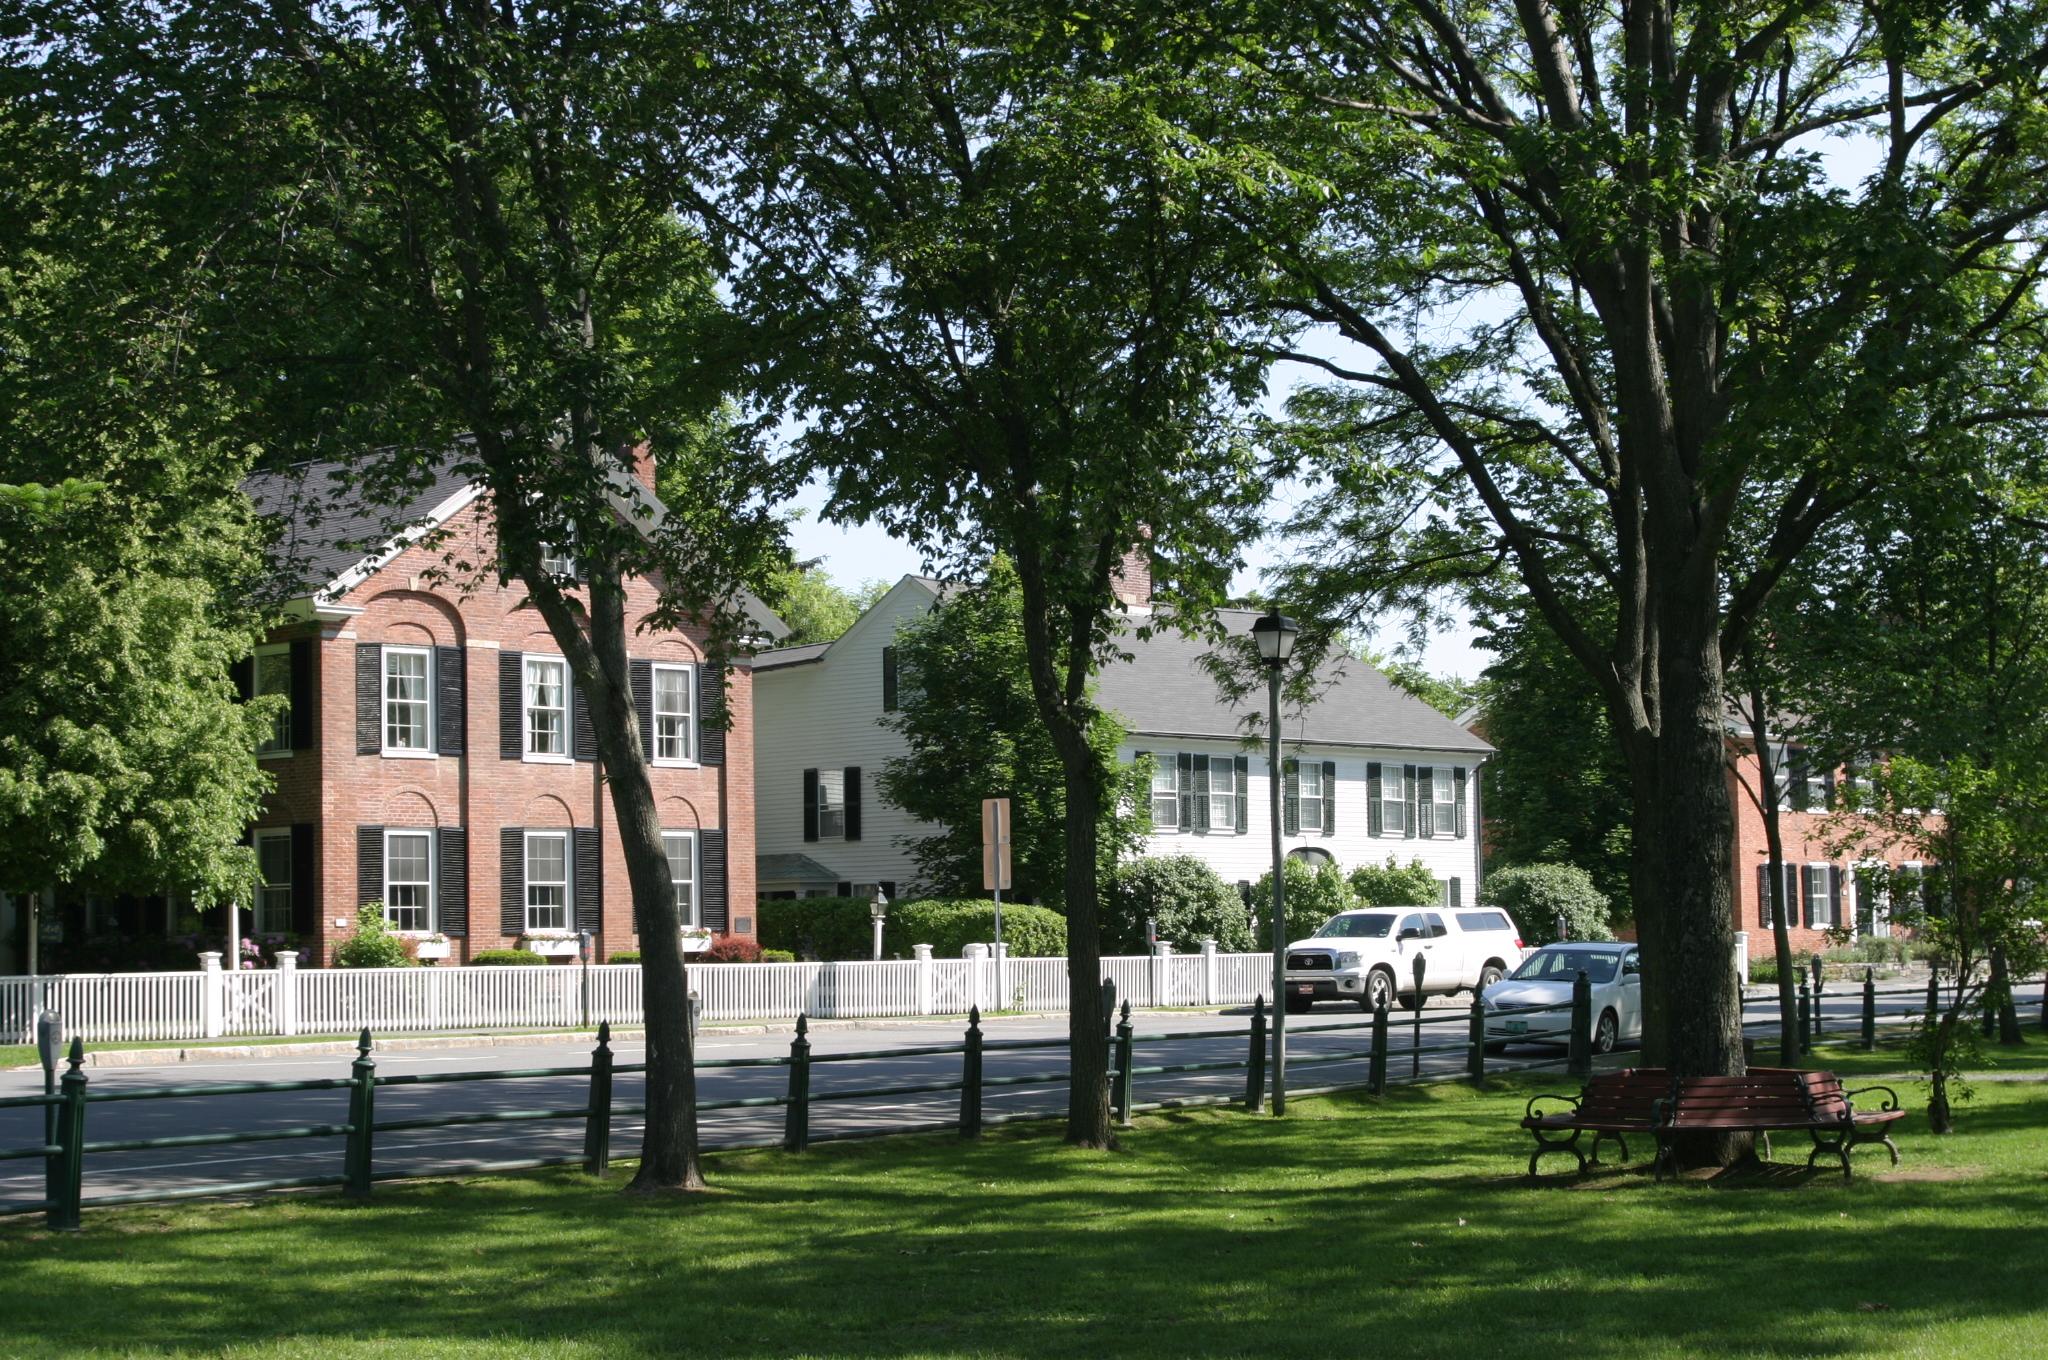 Brick Colonials in Woodstock VT